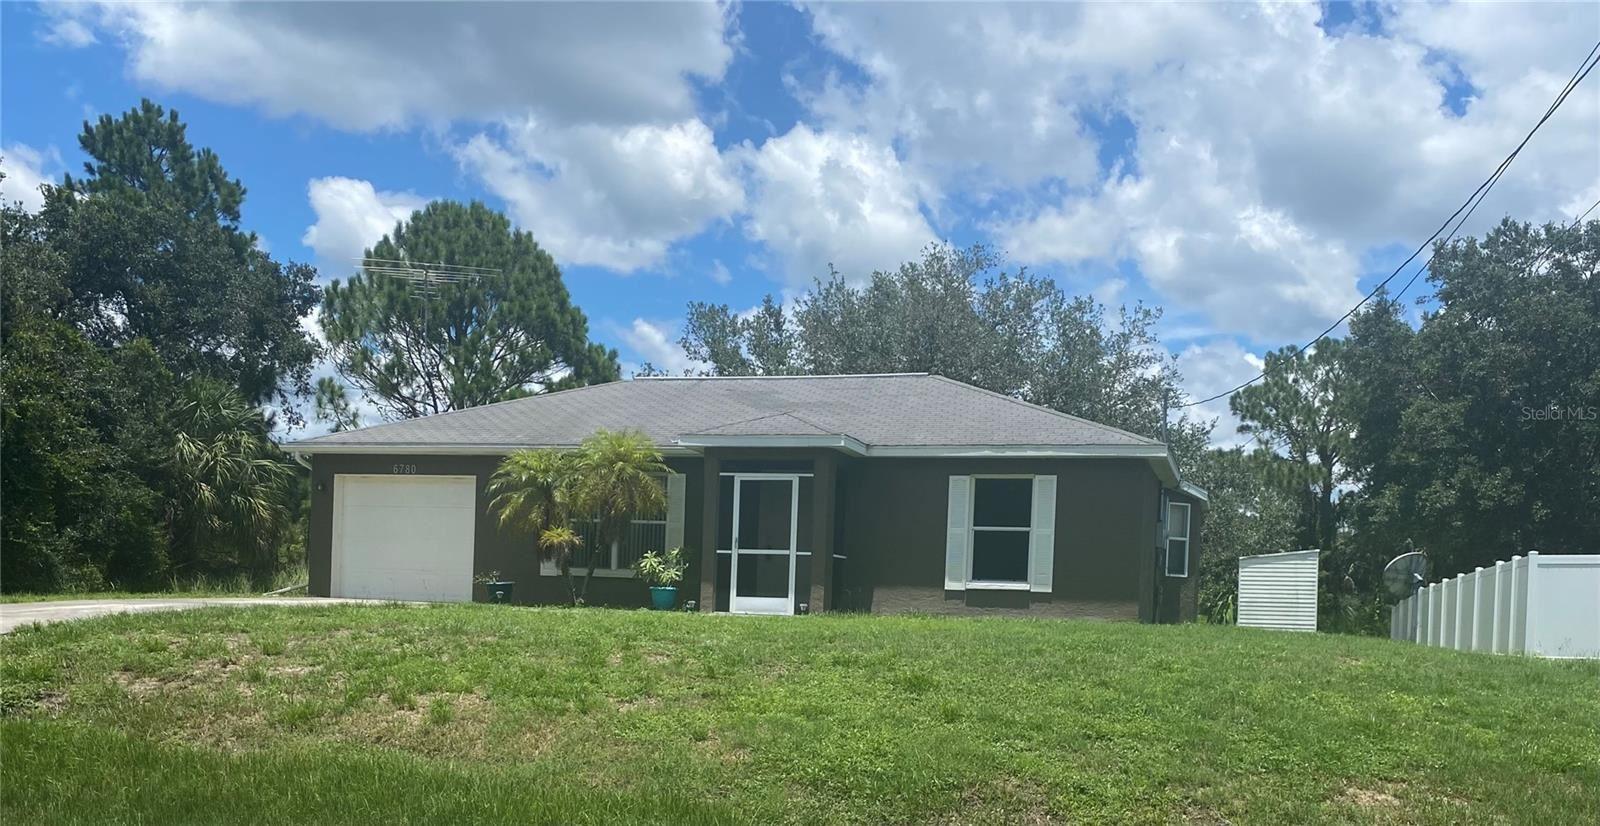 Photo of 6780 ABADY LANE, NORTH PORT, FL 34291 (MLS # C7446269)